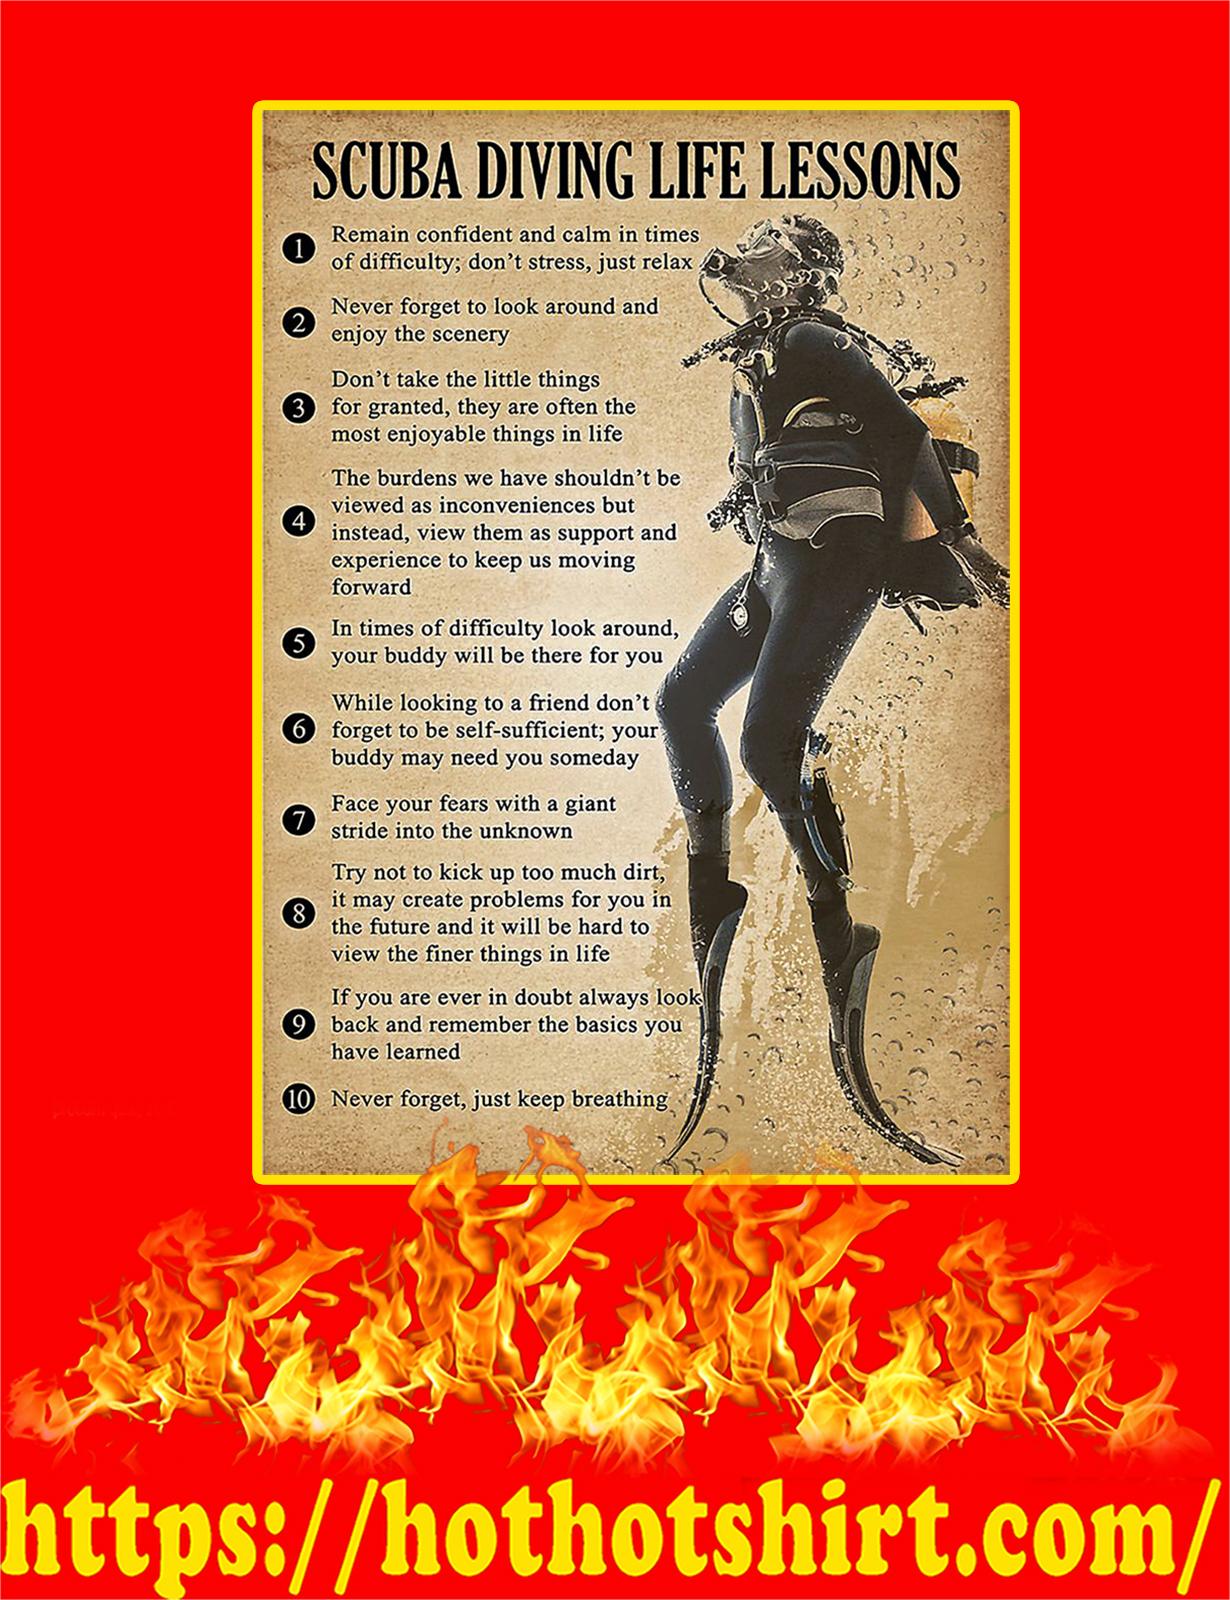 Scuba Diving Life Lessons Poster - A3